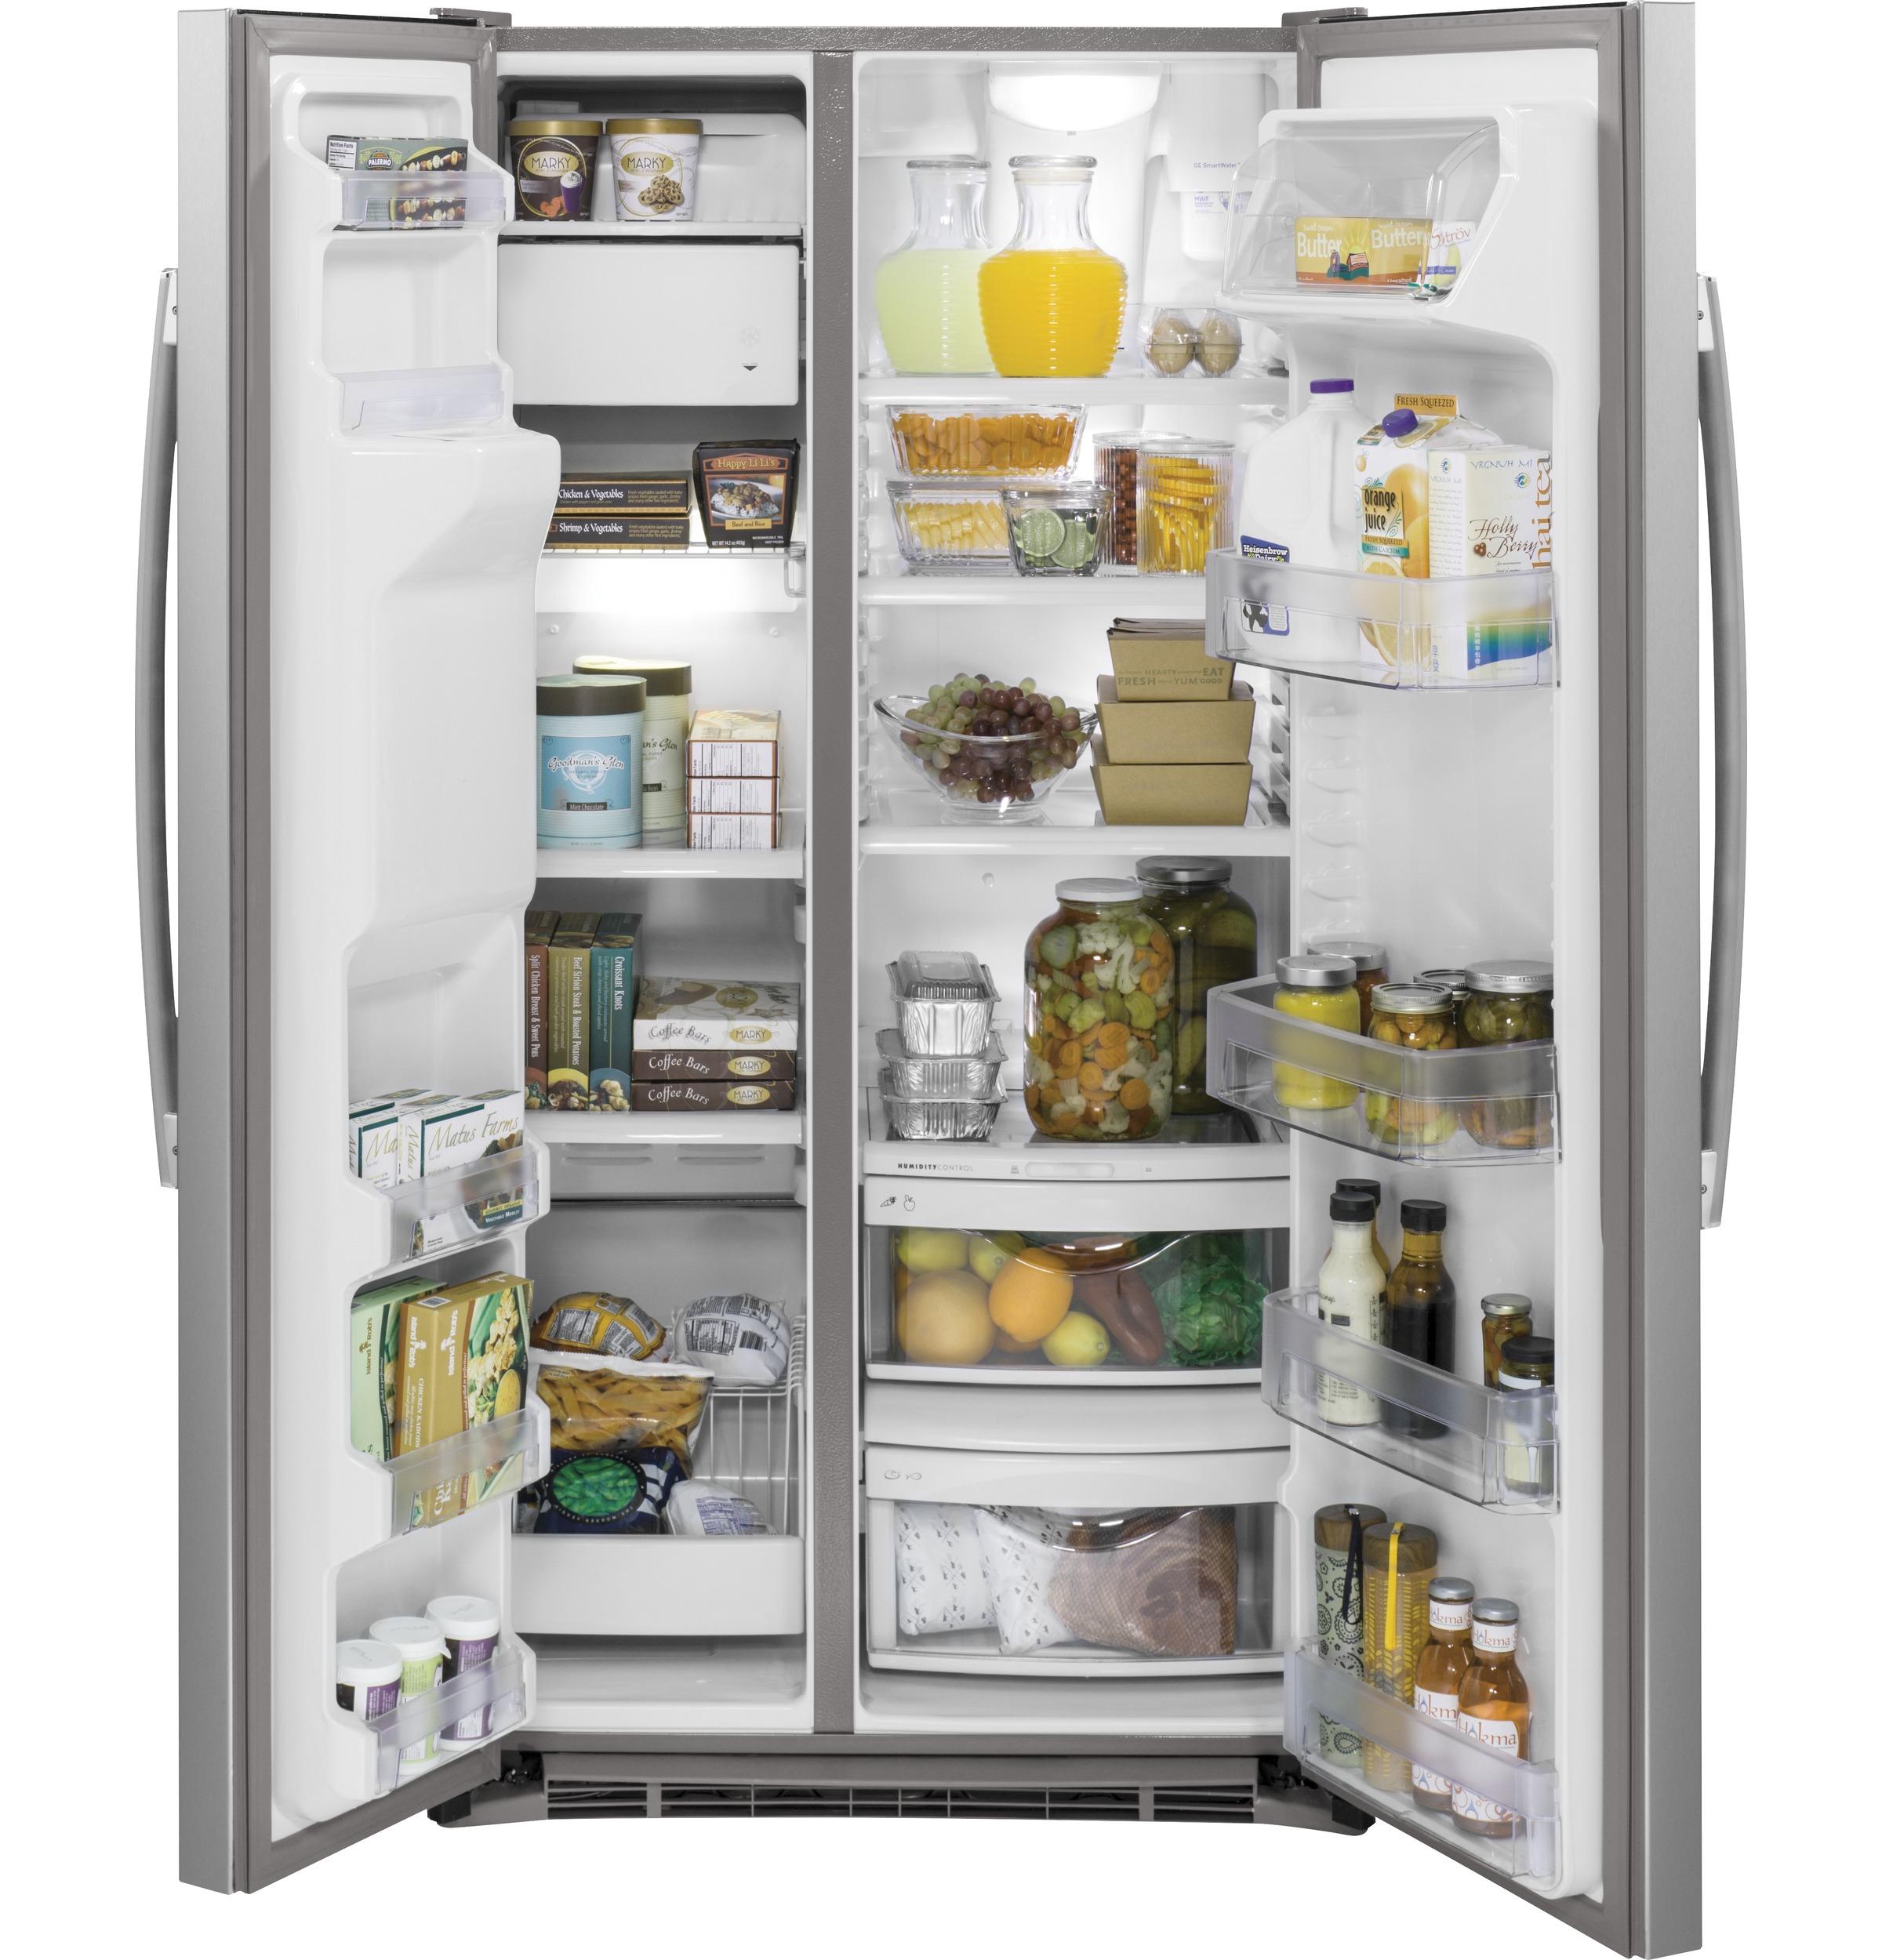 Model: GZS22DSJSS | GE® 21.9 Cu. Ft. Counter-Depth Side-By-Side Refrigerator